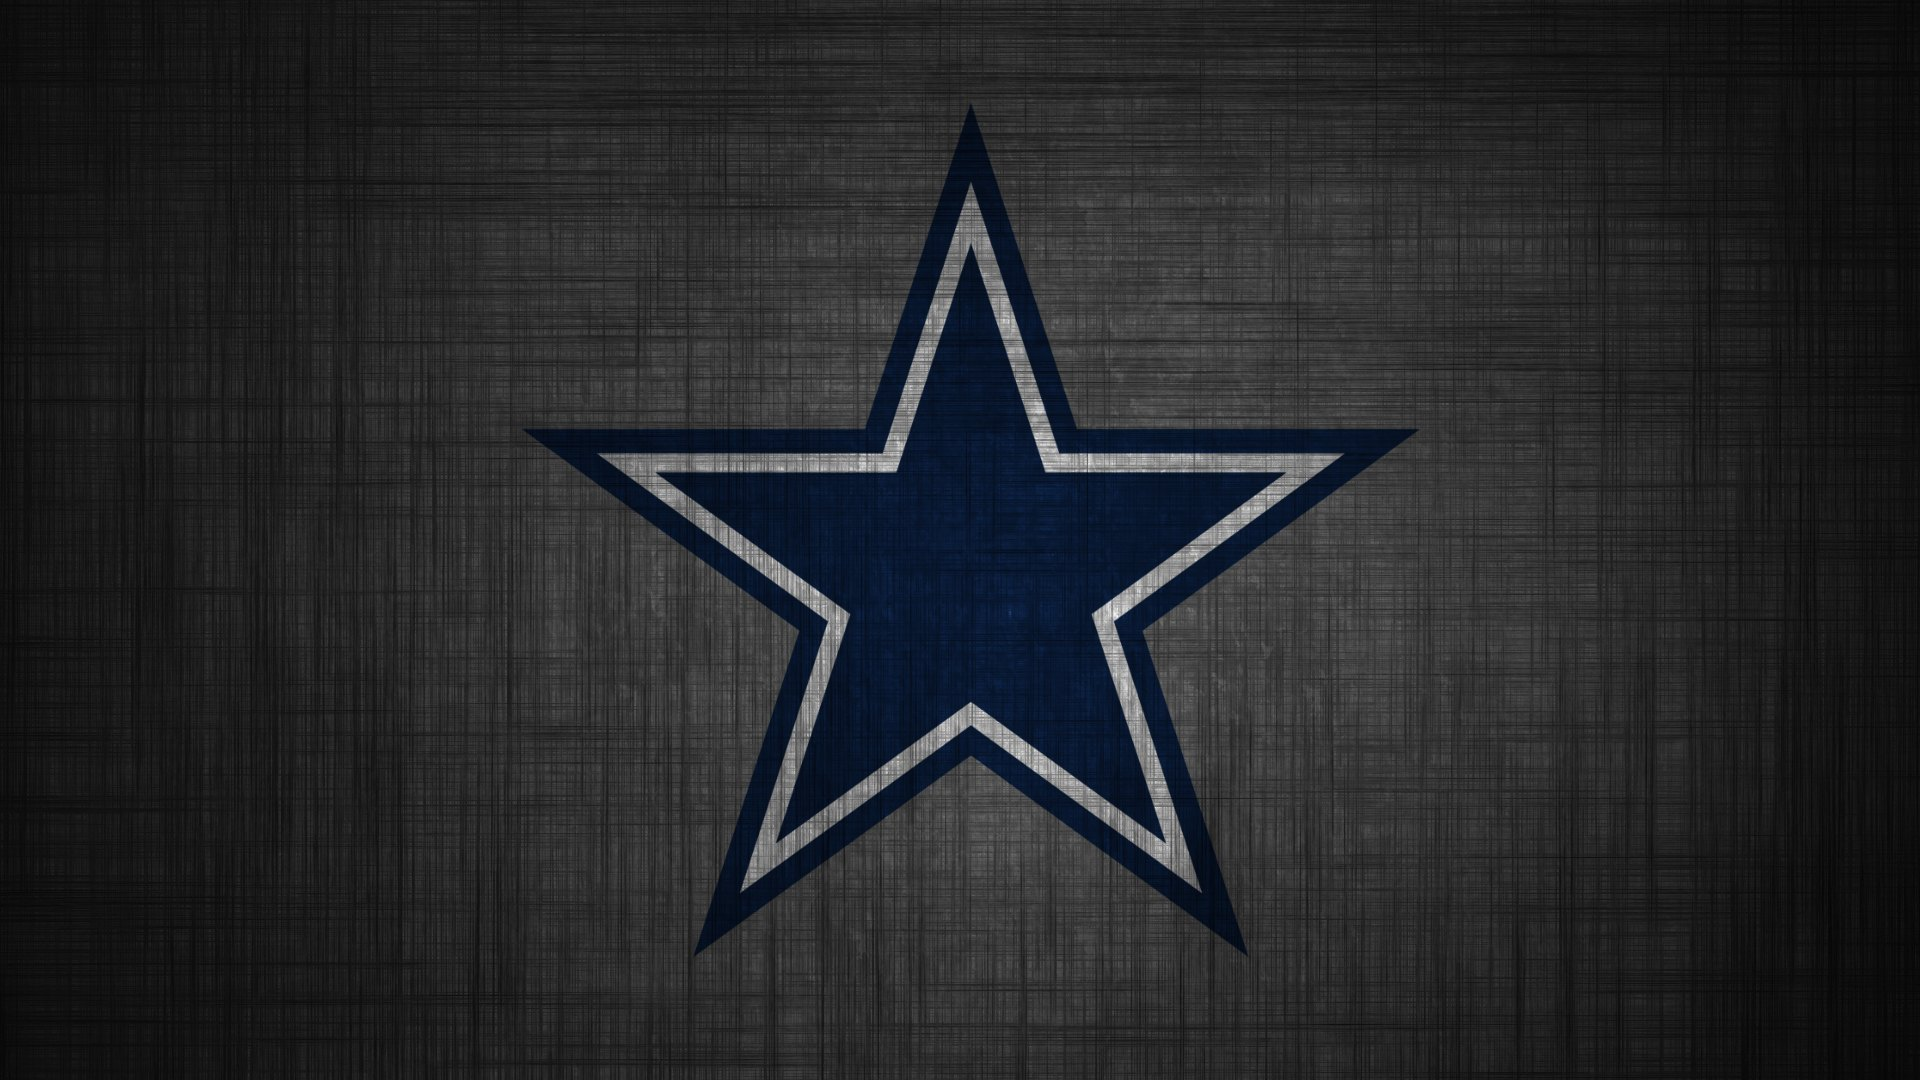 Dallas Cowboys Desktop HD Wallpapers 13341   HD Wallpapers 1920x1080